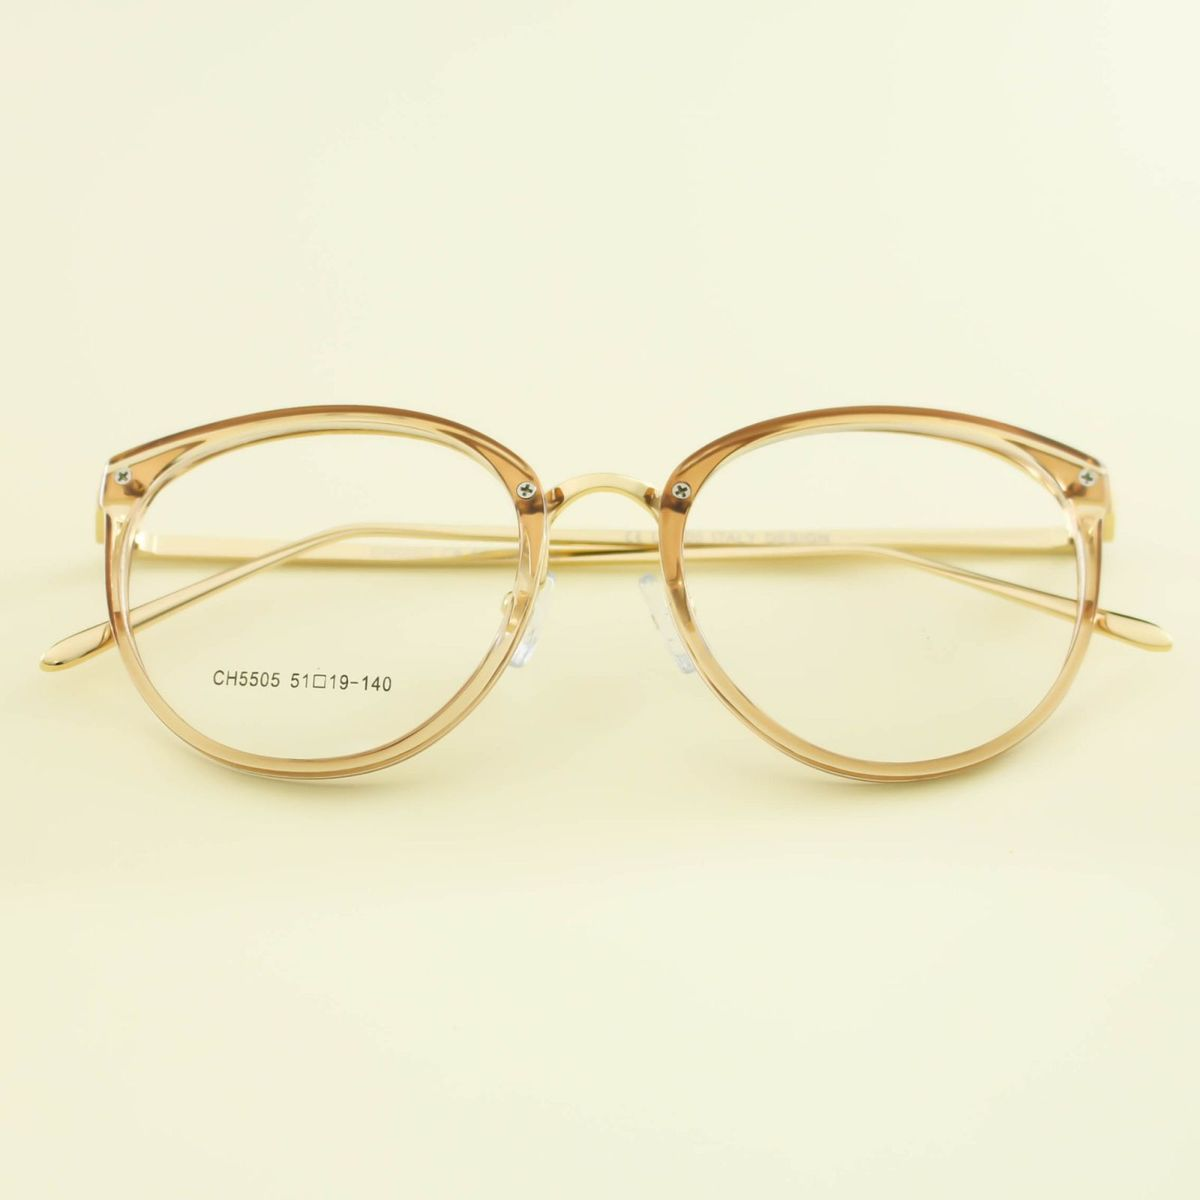 armação vintage transparente - óculos kitshloja.  Czm6ly9wag90b3muzw5qb2vplmnvbs5ici9wcm9kdwn0cy8xnze0njkvzdkyodg0nwewzte2nde1mtbmowzln2u3m2e4ogrjnjmuanbn  ... 39edf2b66b